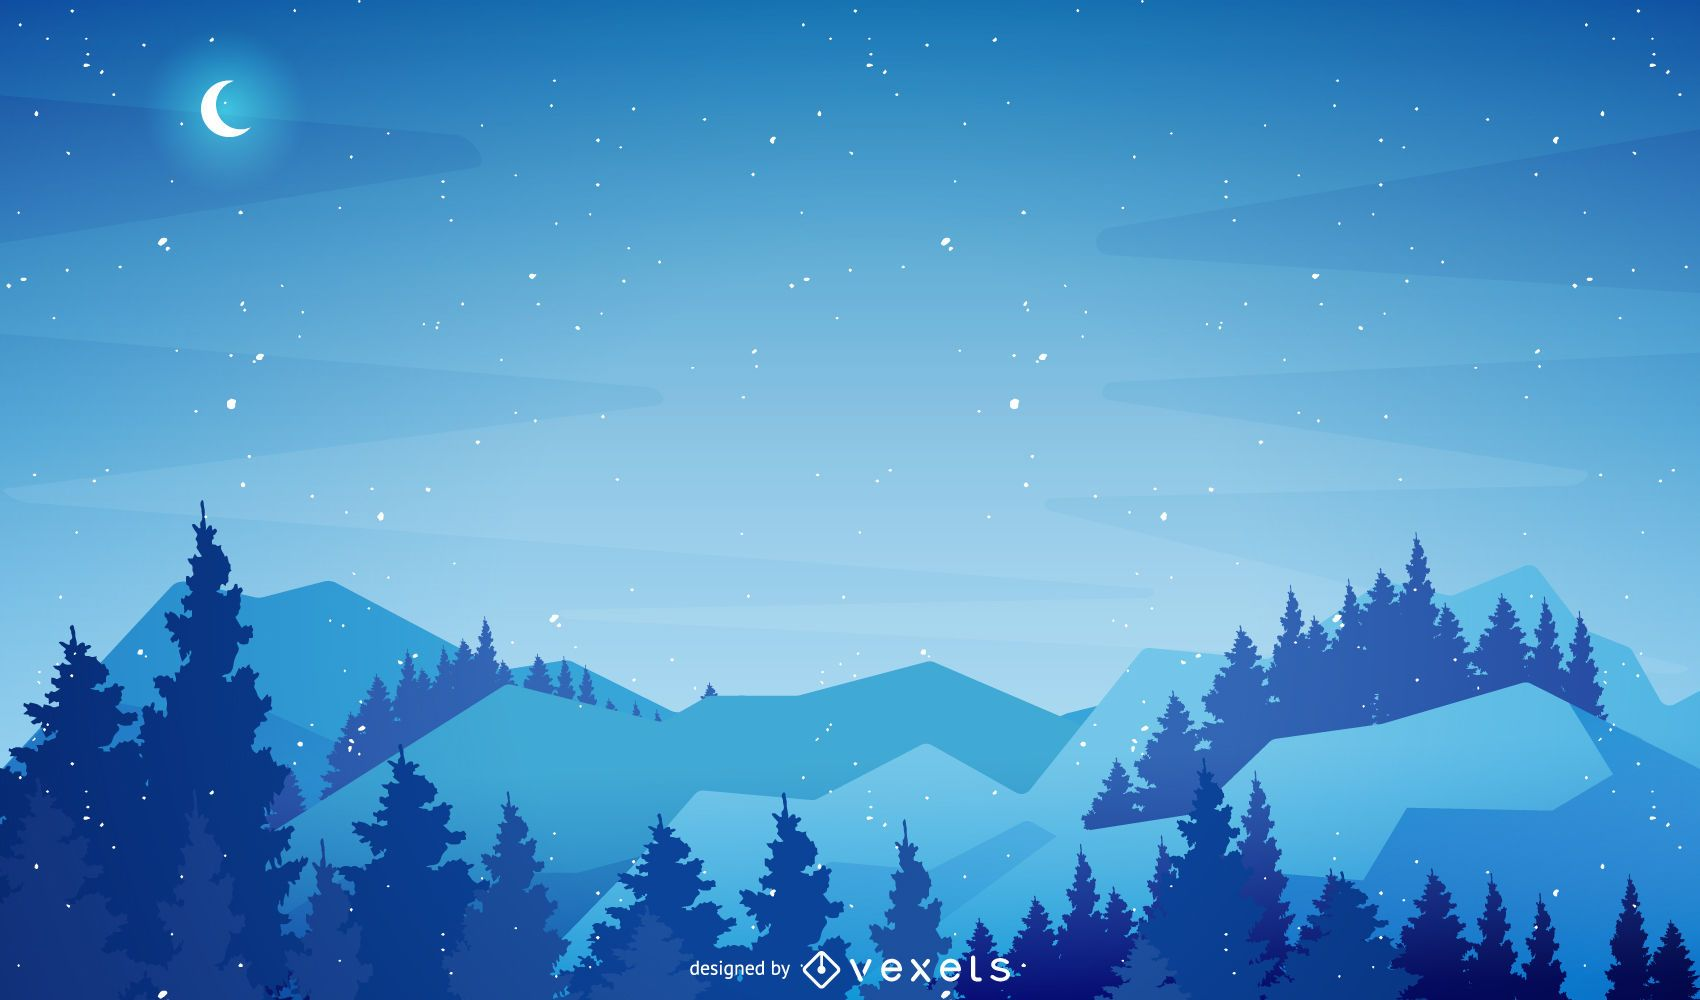 Christmas winter scenery background